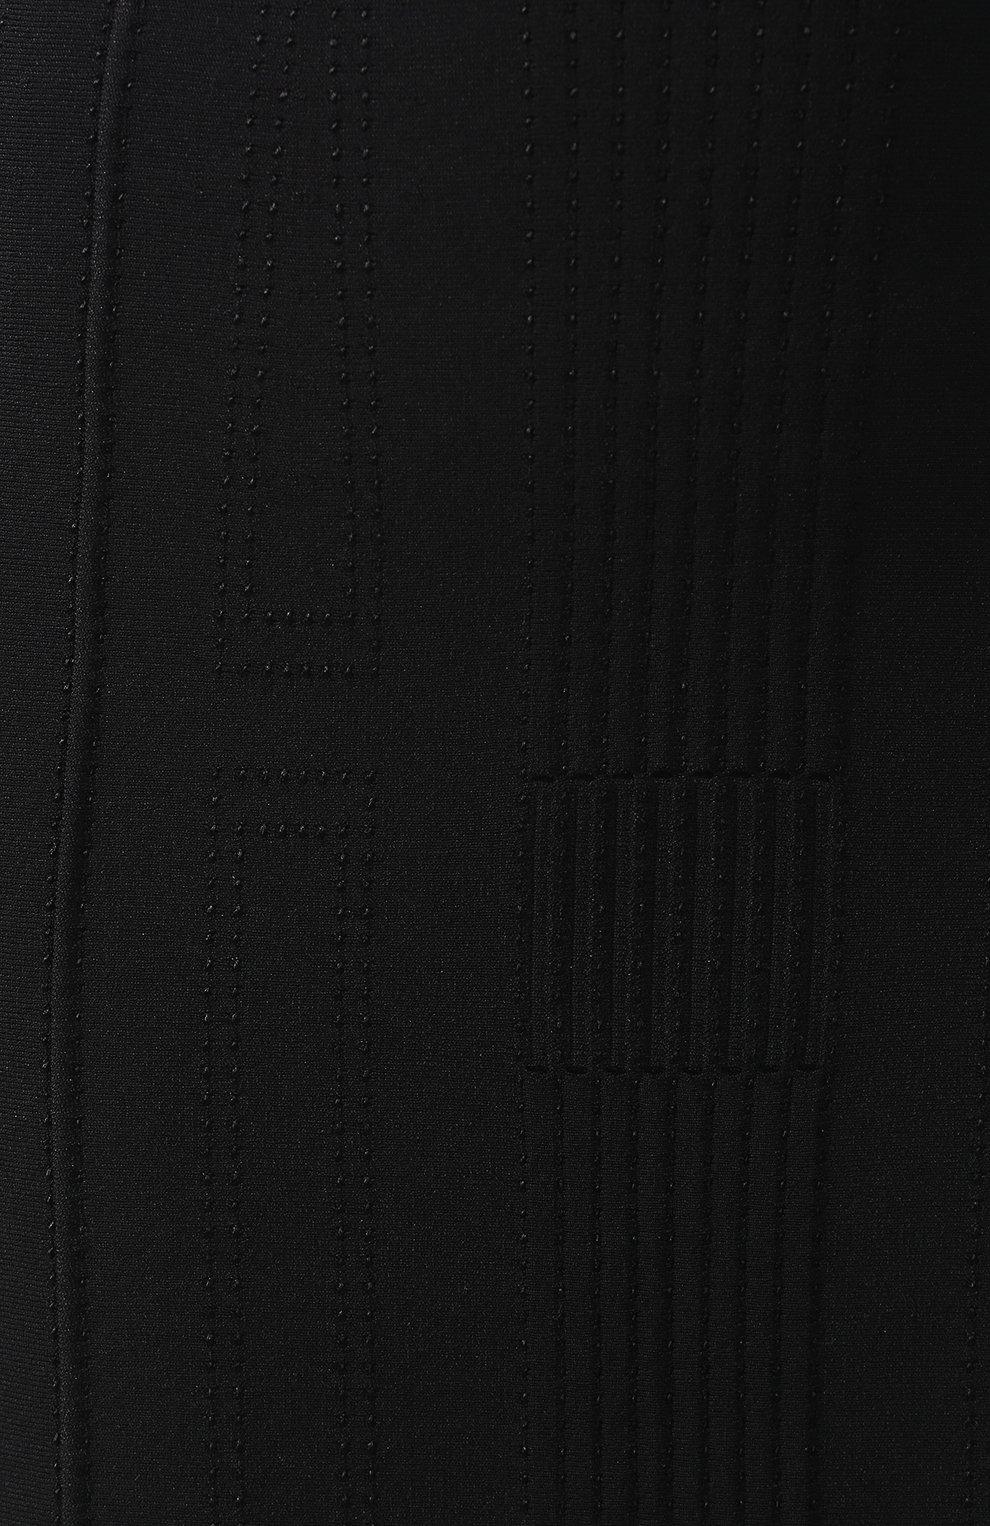 Юбка из смеси вискозы и шелка | Фото №5